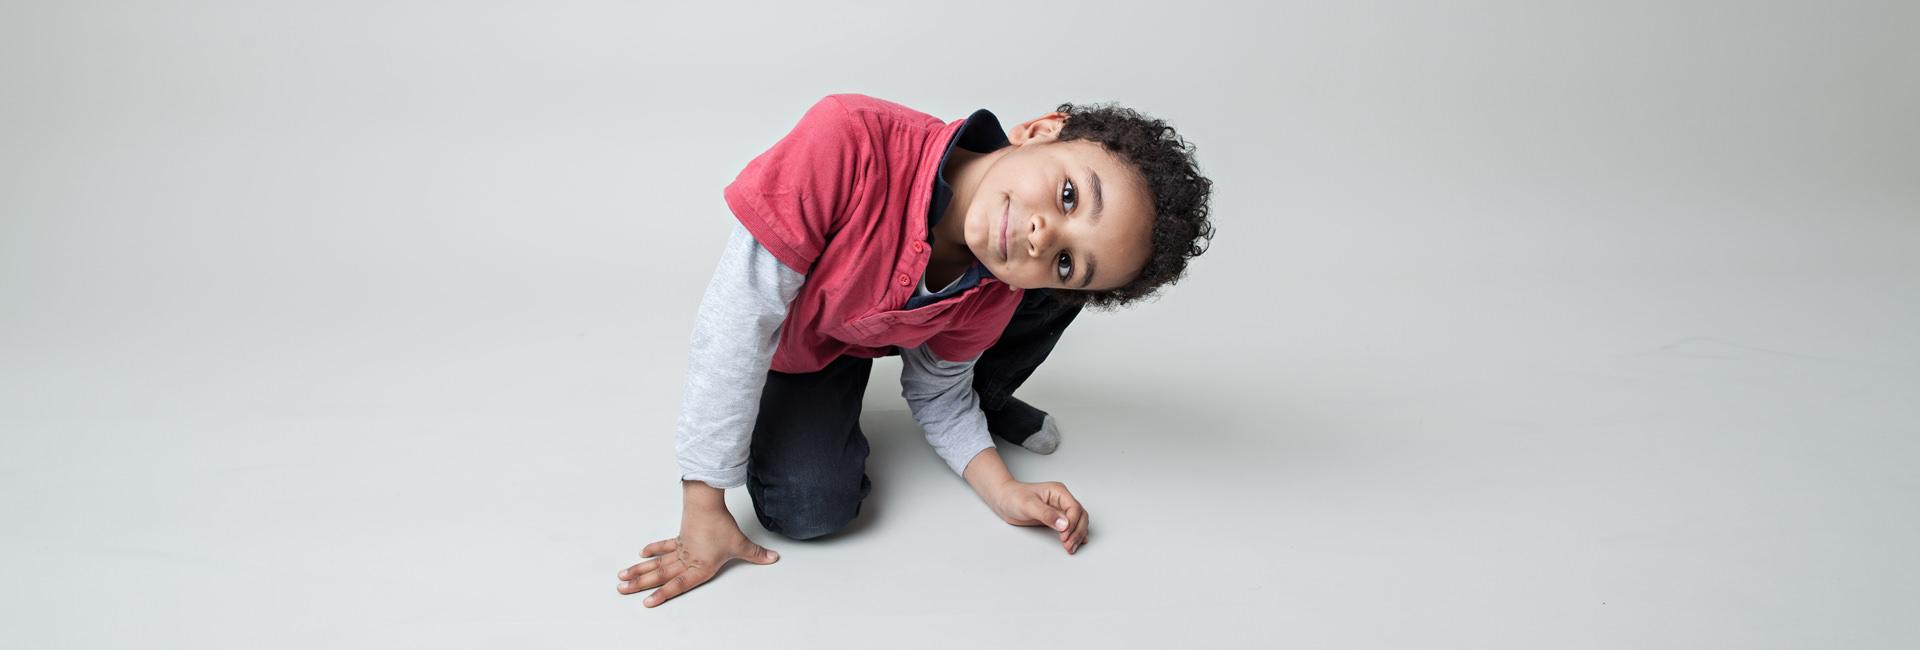 photographe-studio-pornichet-enfant